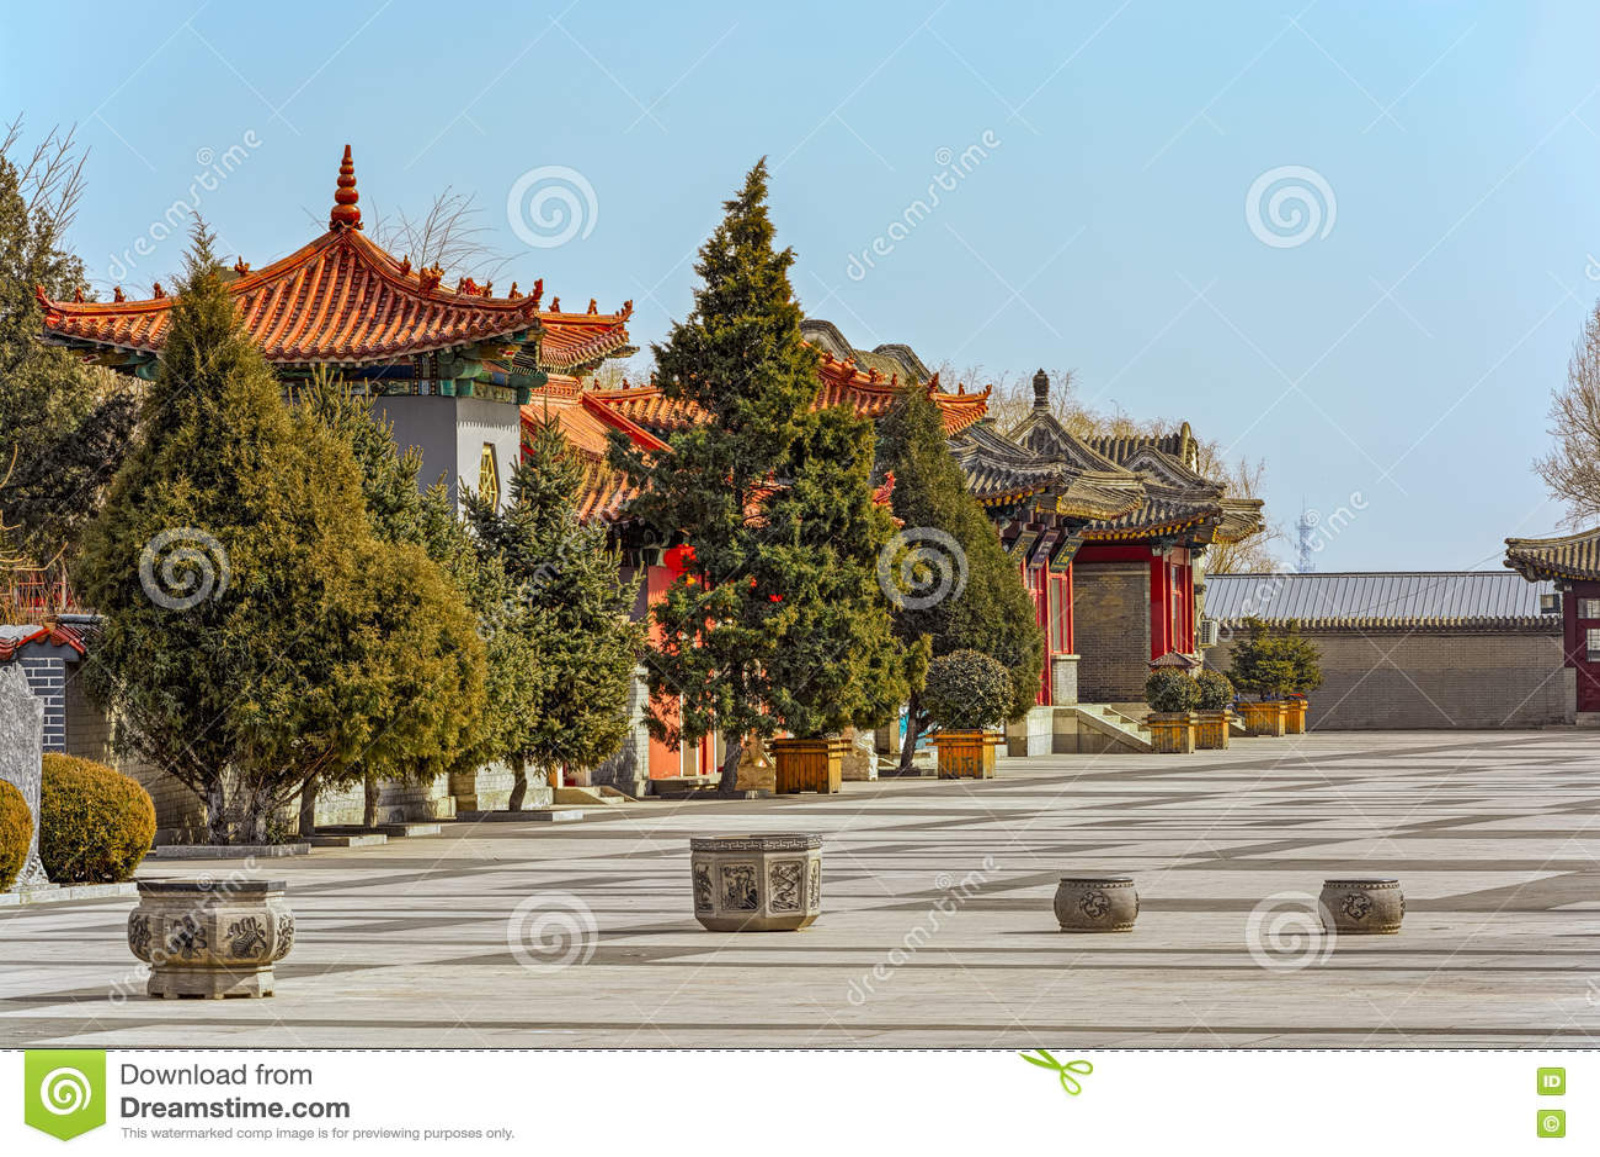 Arquitectura china antigua en la Gran Muralla de China